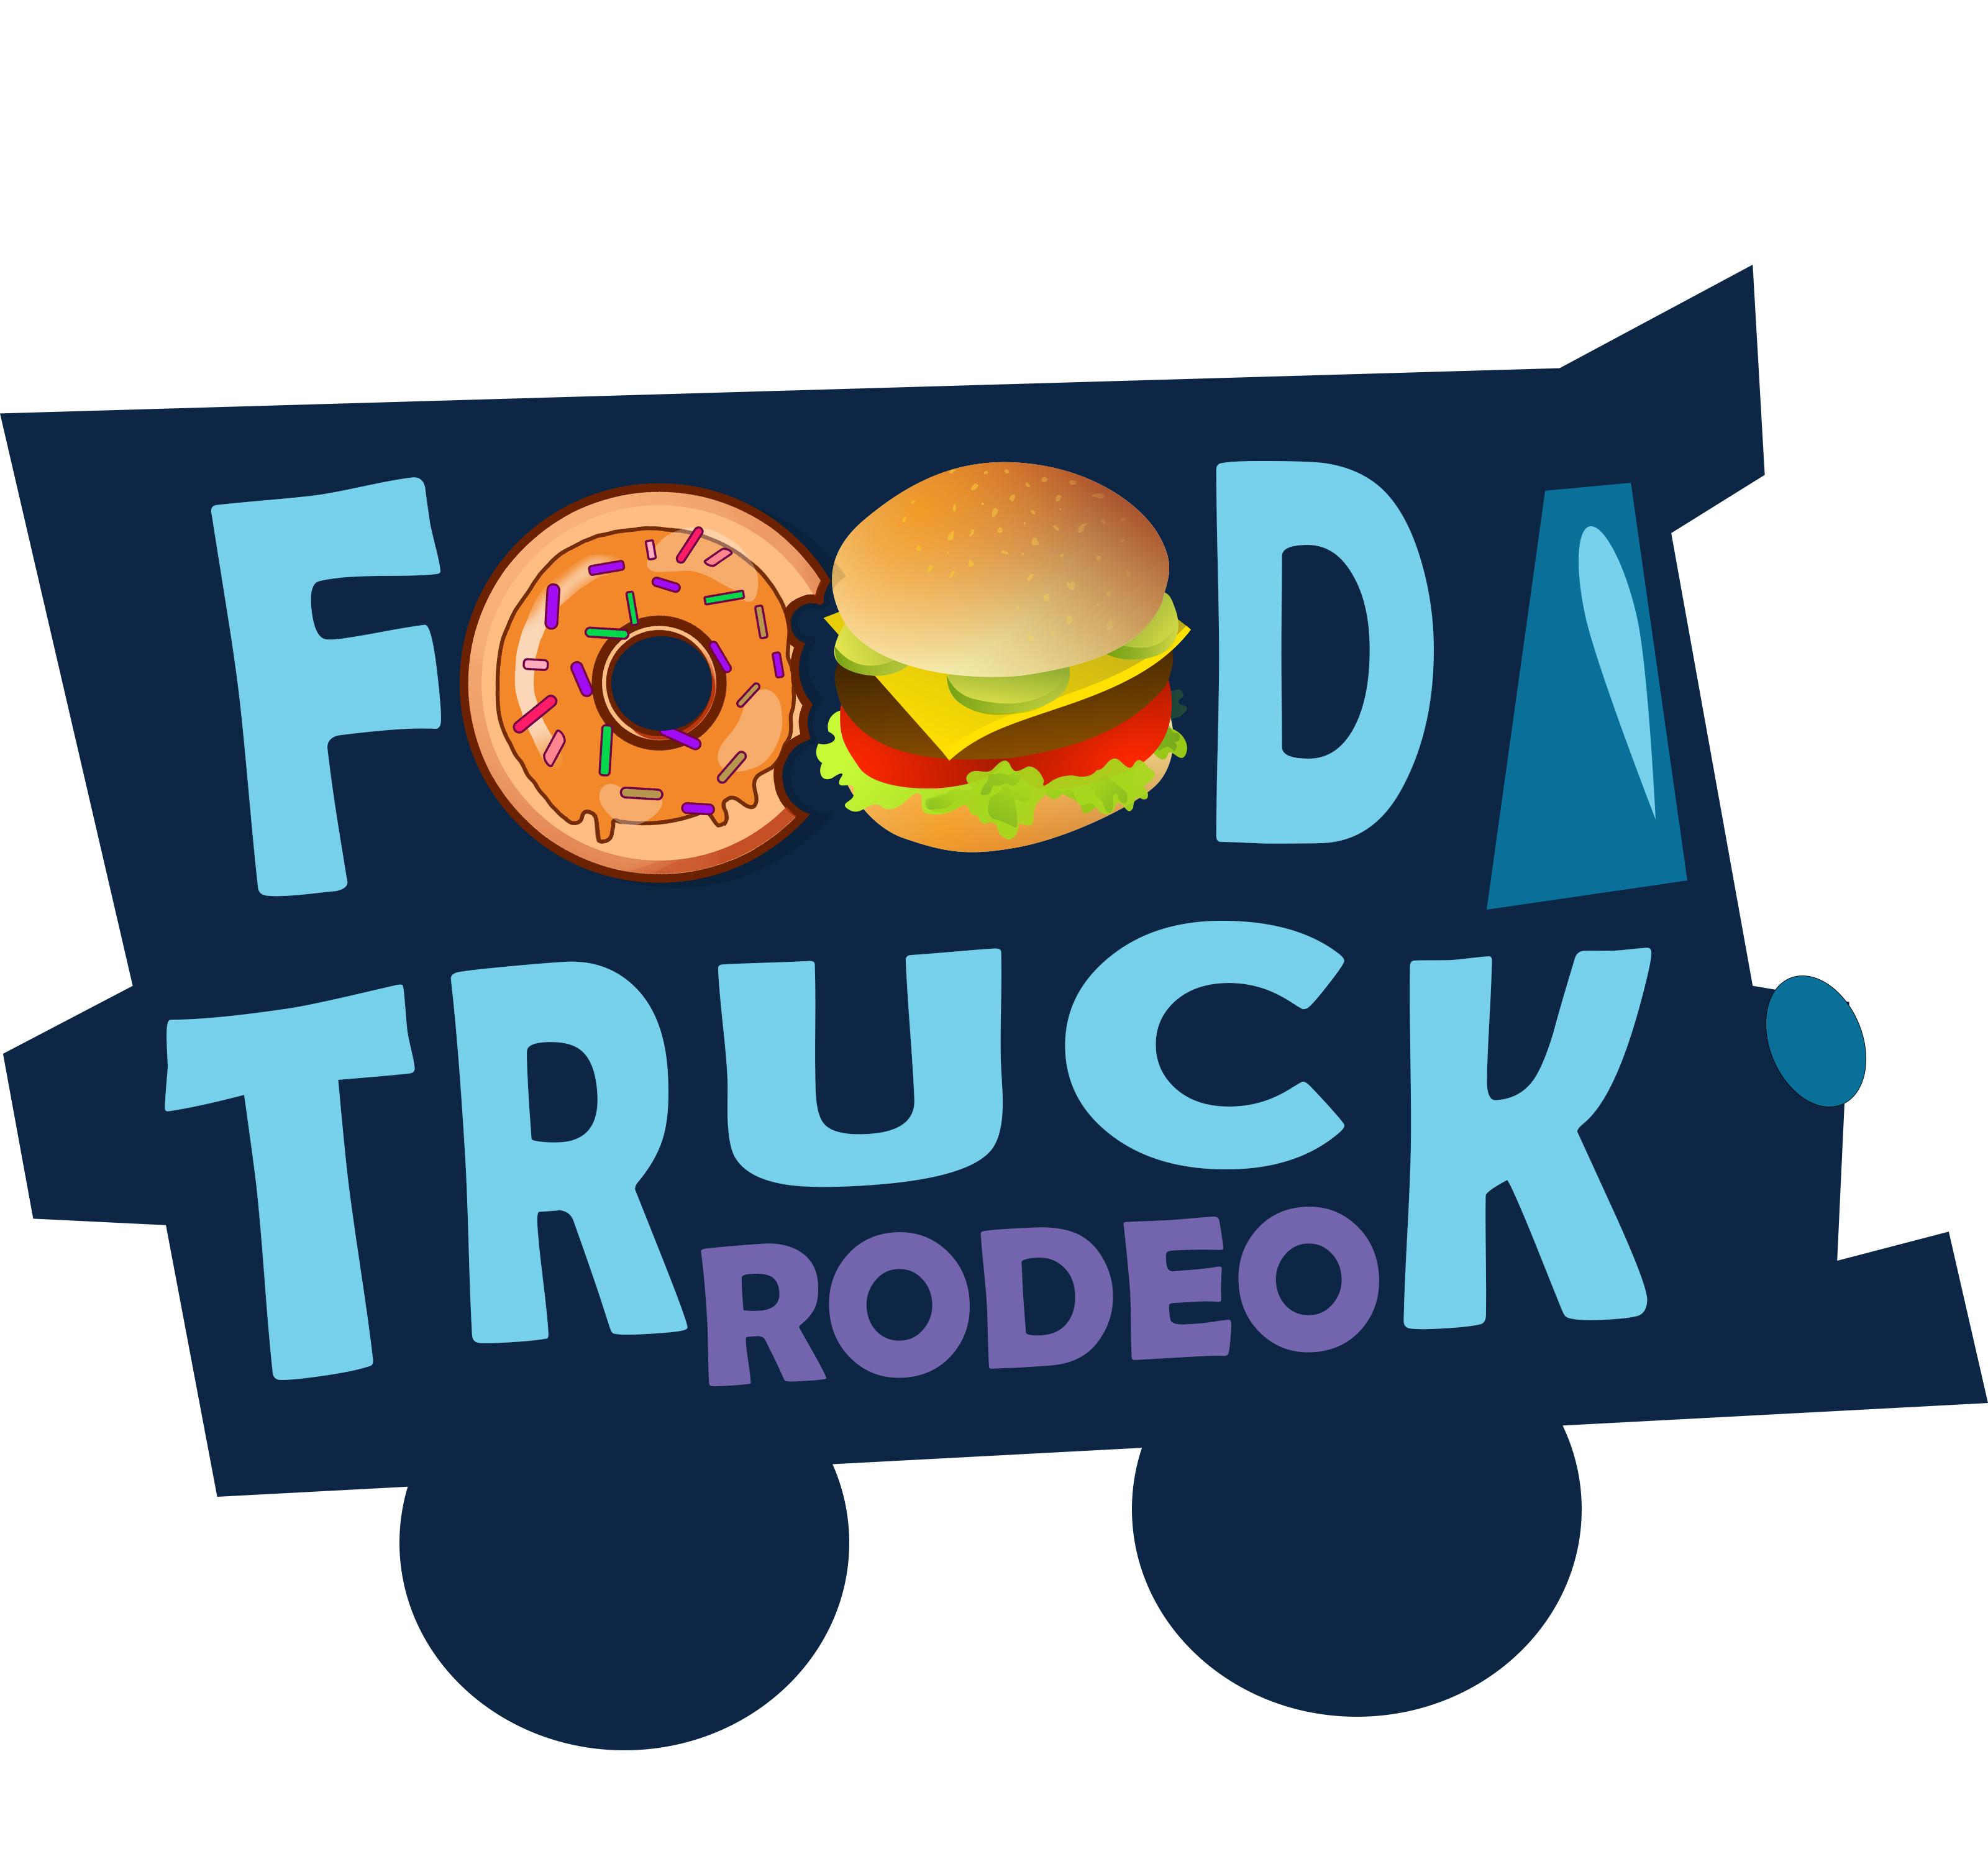 Food Truck Rodeo Wilmington Nc